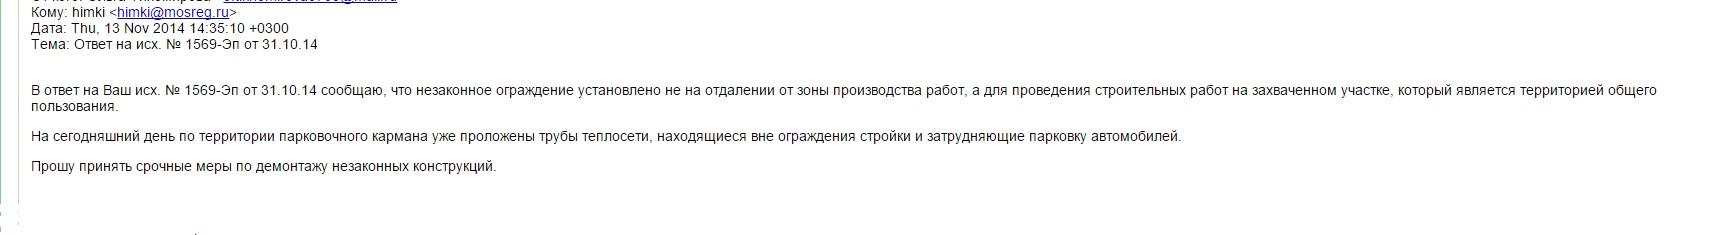 Тихимирова 13-11-2014 ХА